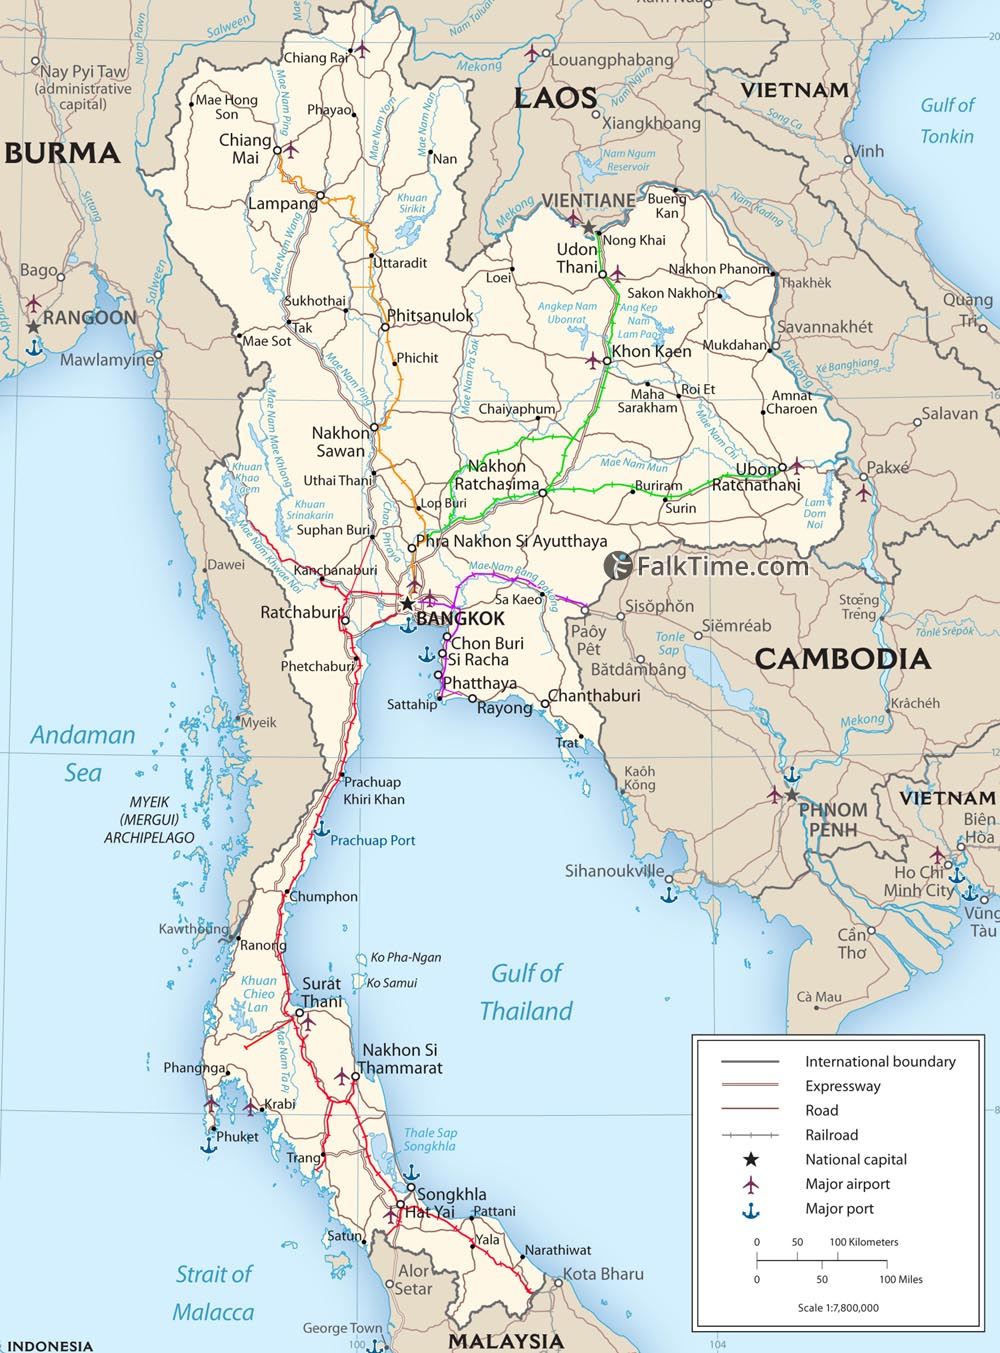 Map of Thai railways